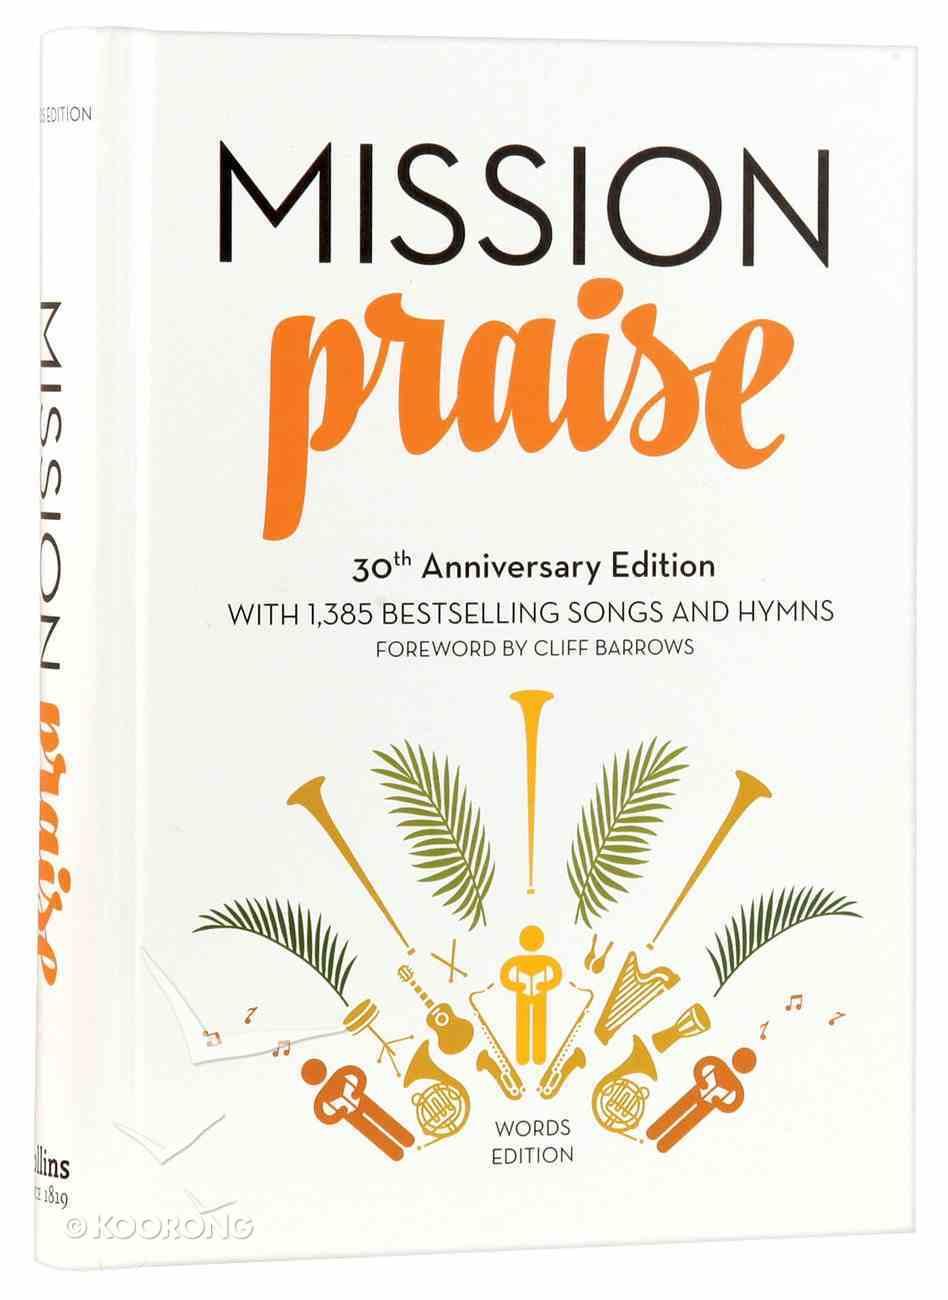 Complete Mission Praise (30th Anniversary Words Edition) Hardback